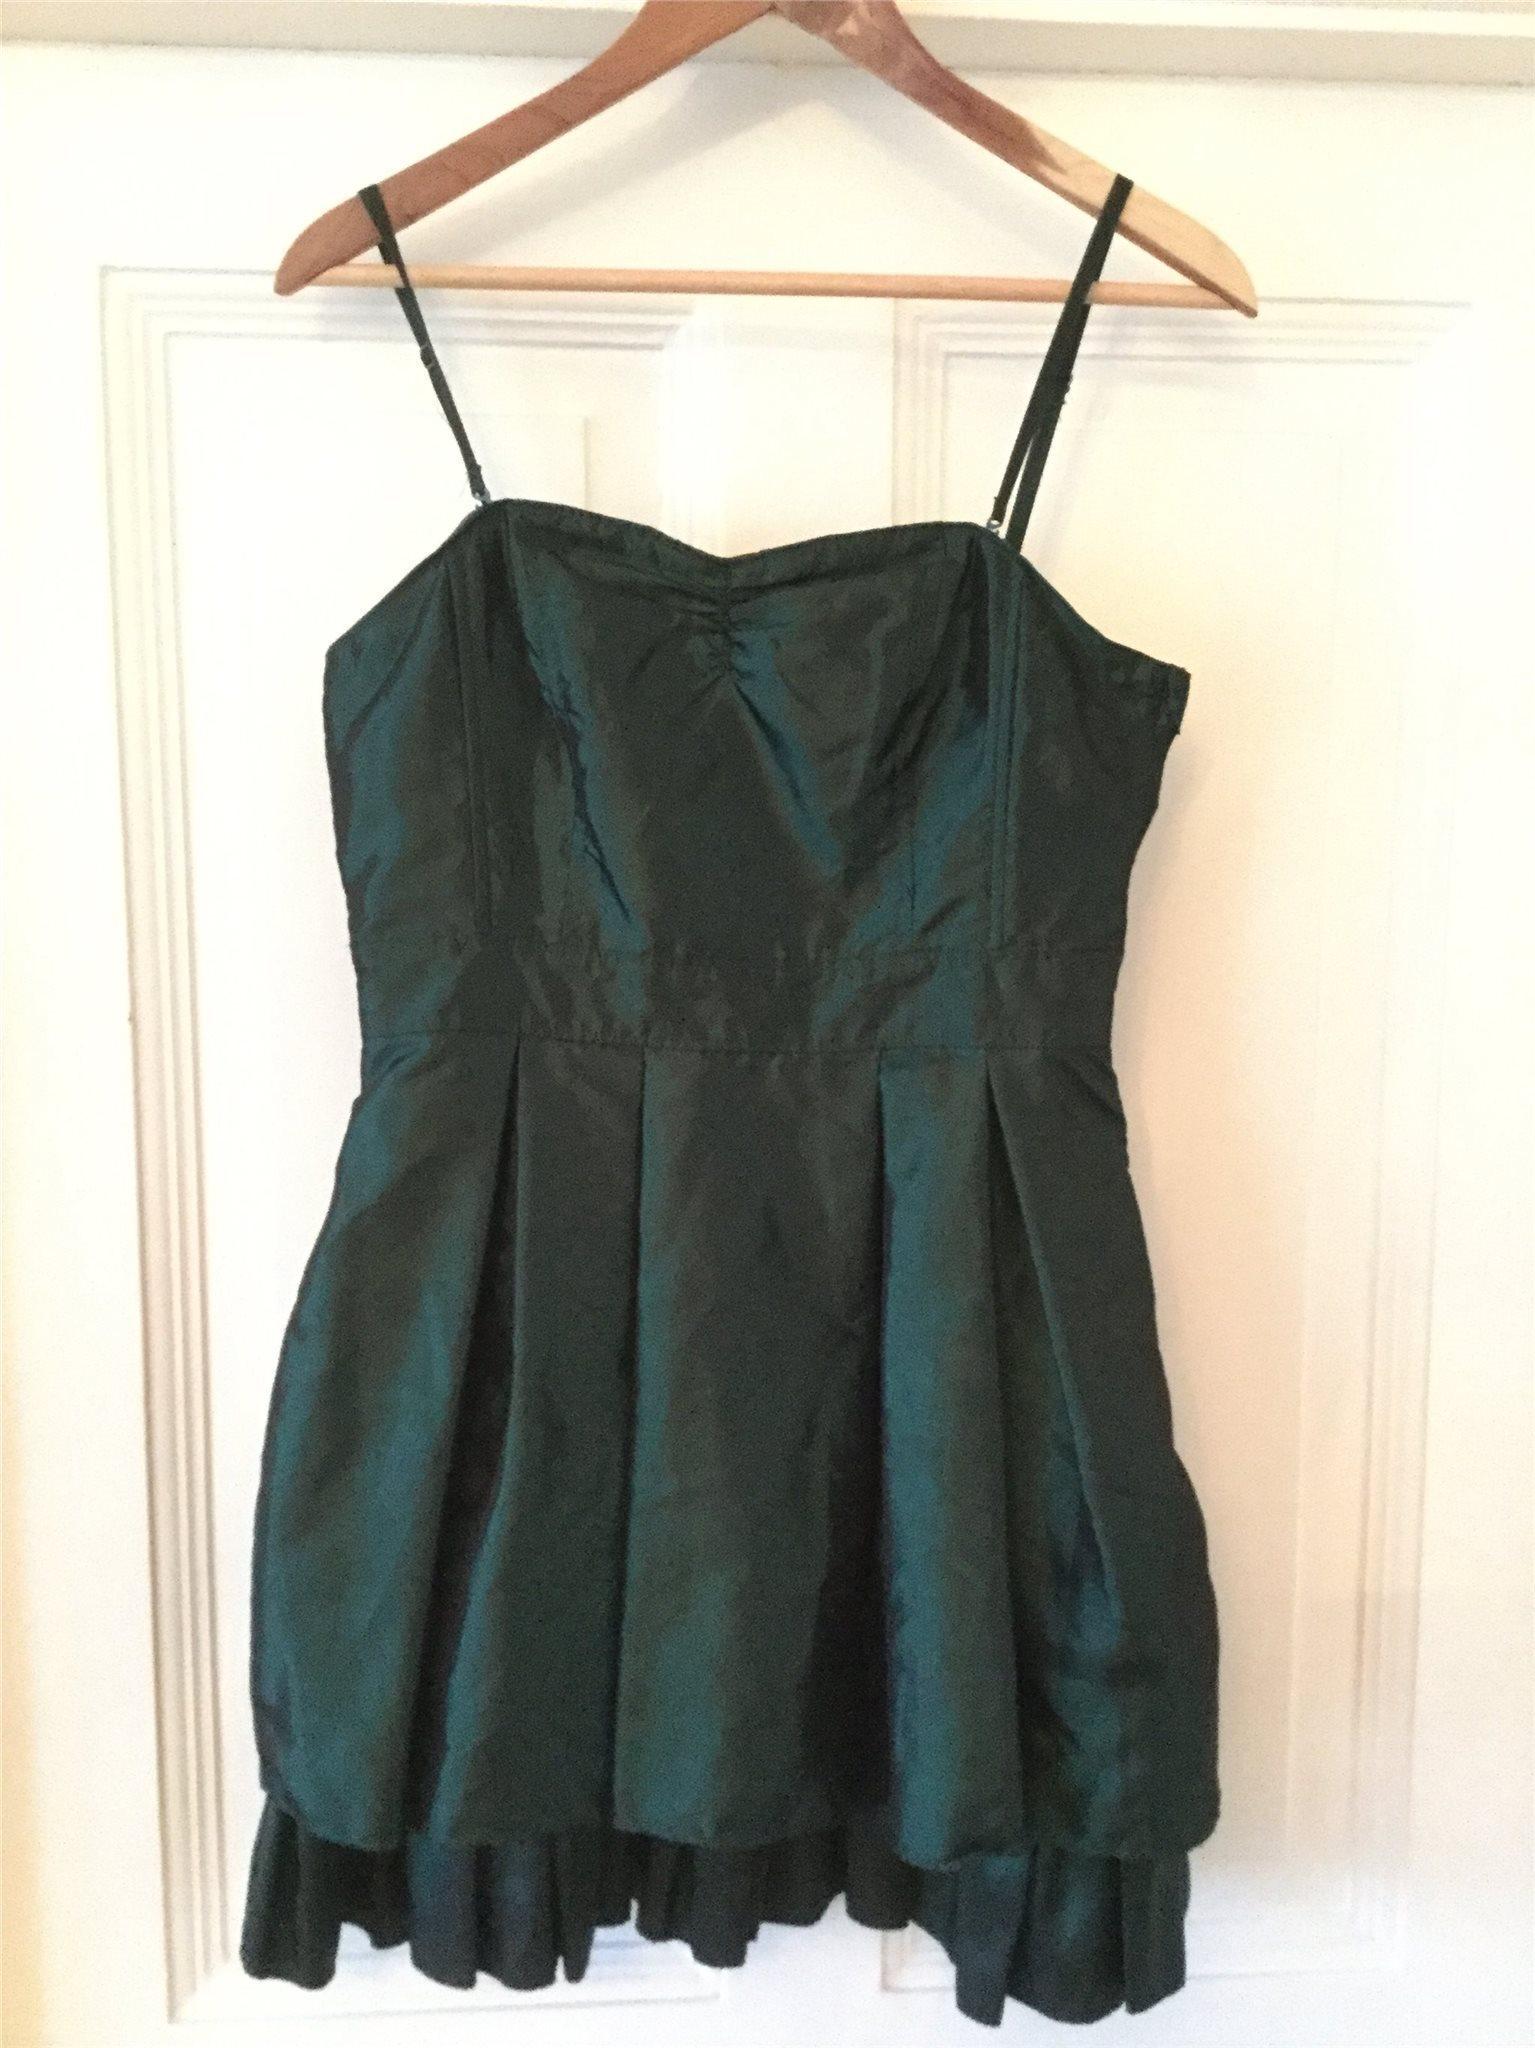 grön klänning fest